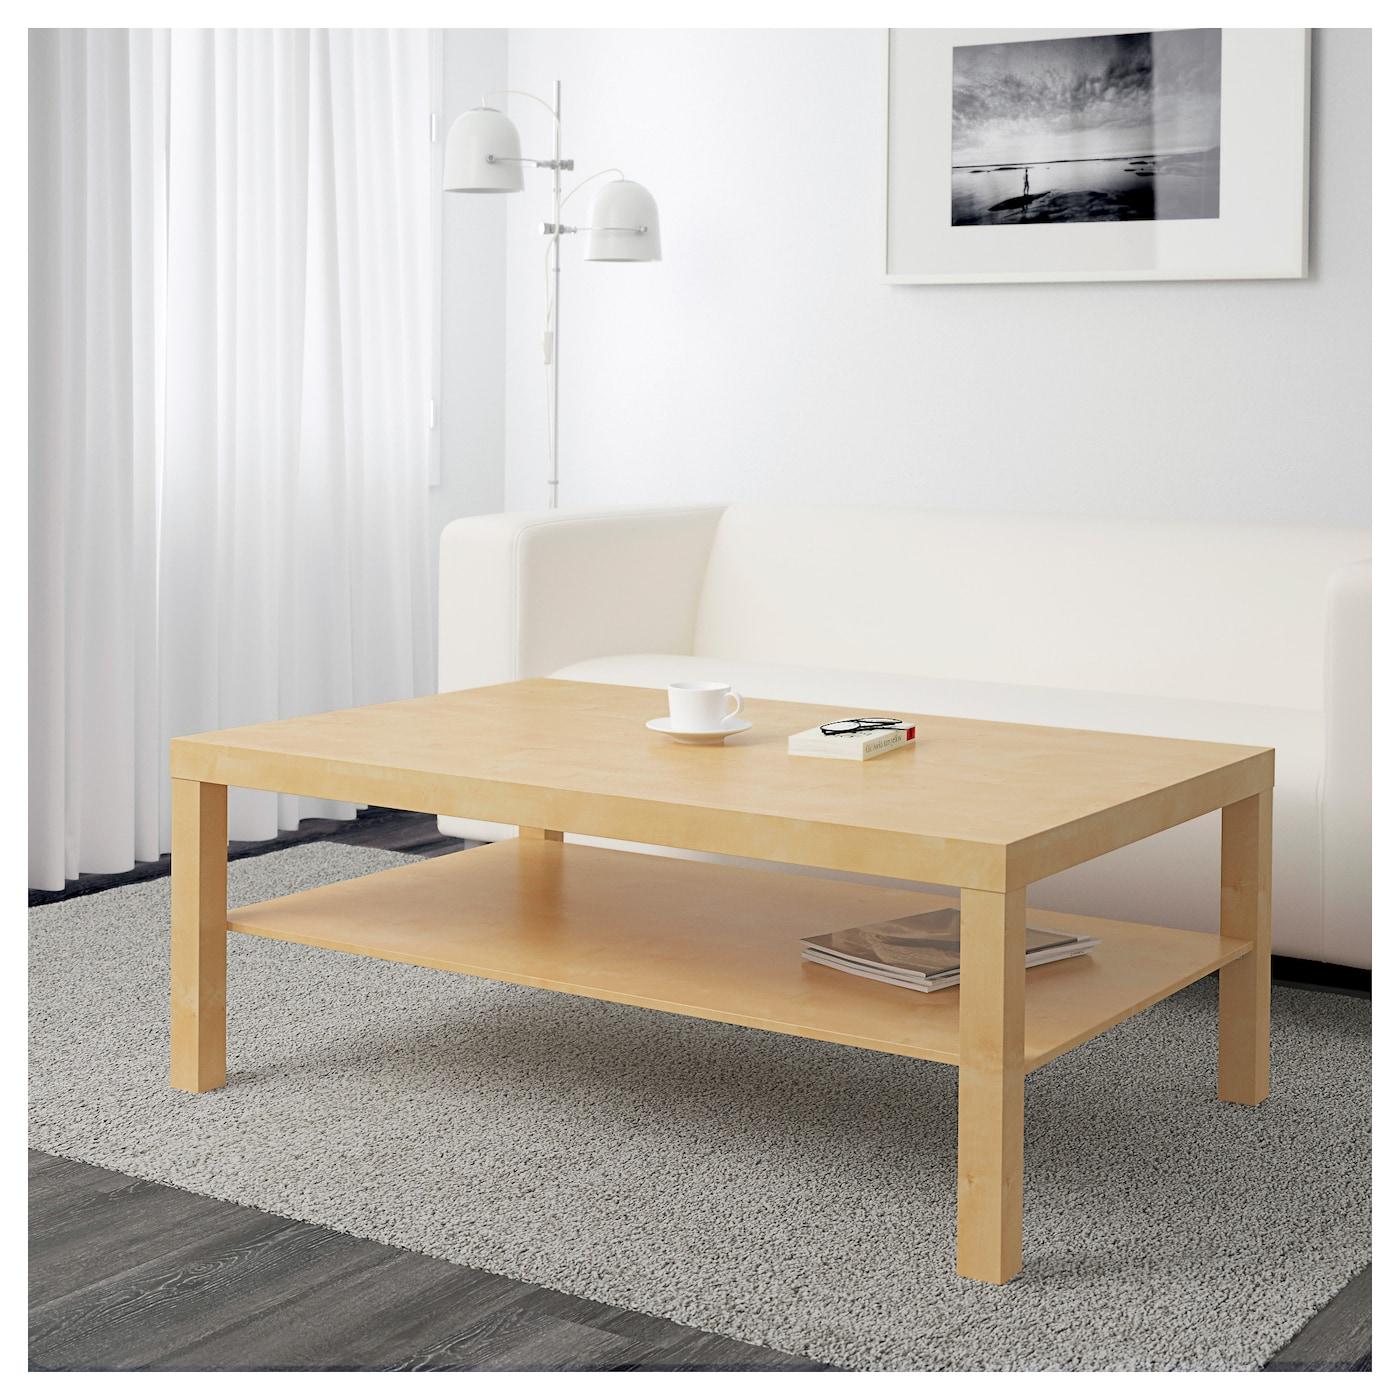 lack coffee table birch effect 118 x 78 cm ikea. Black Bedroom Furniture Sets. Home Design Ideas